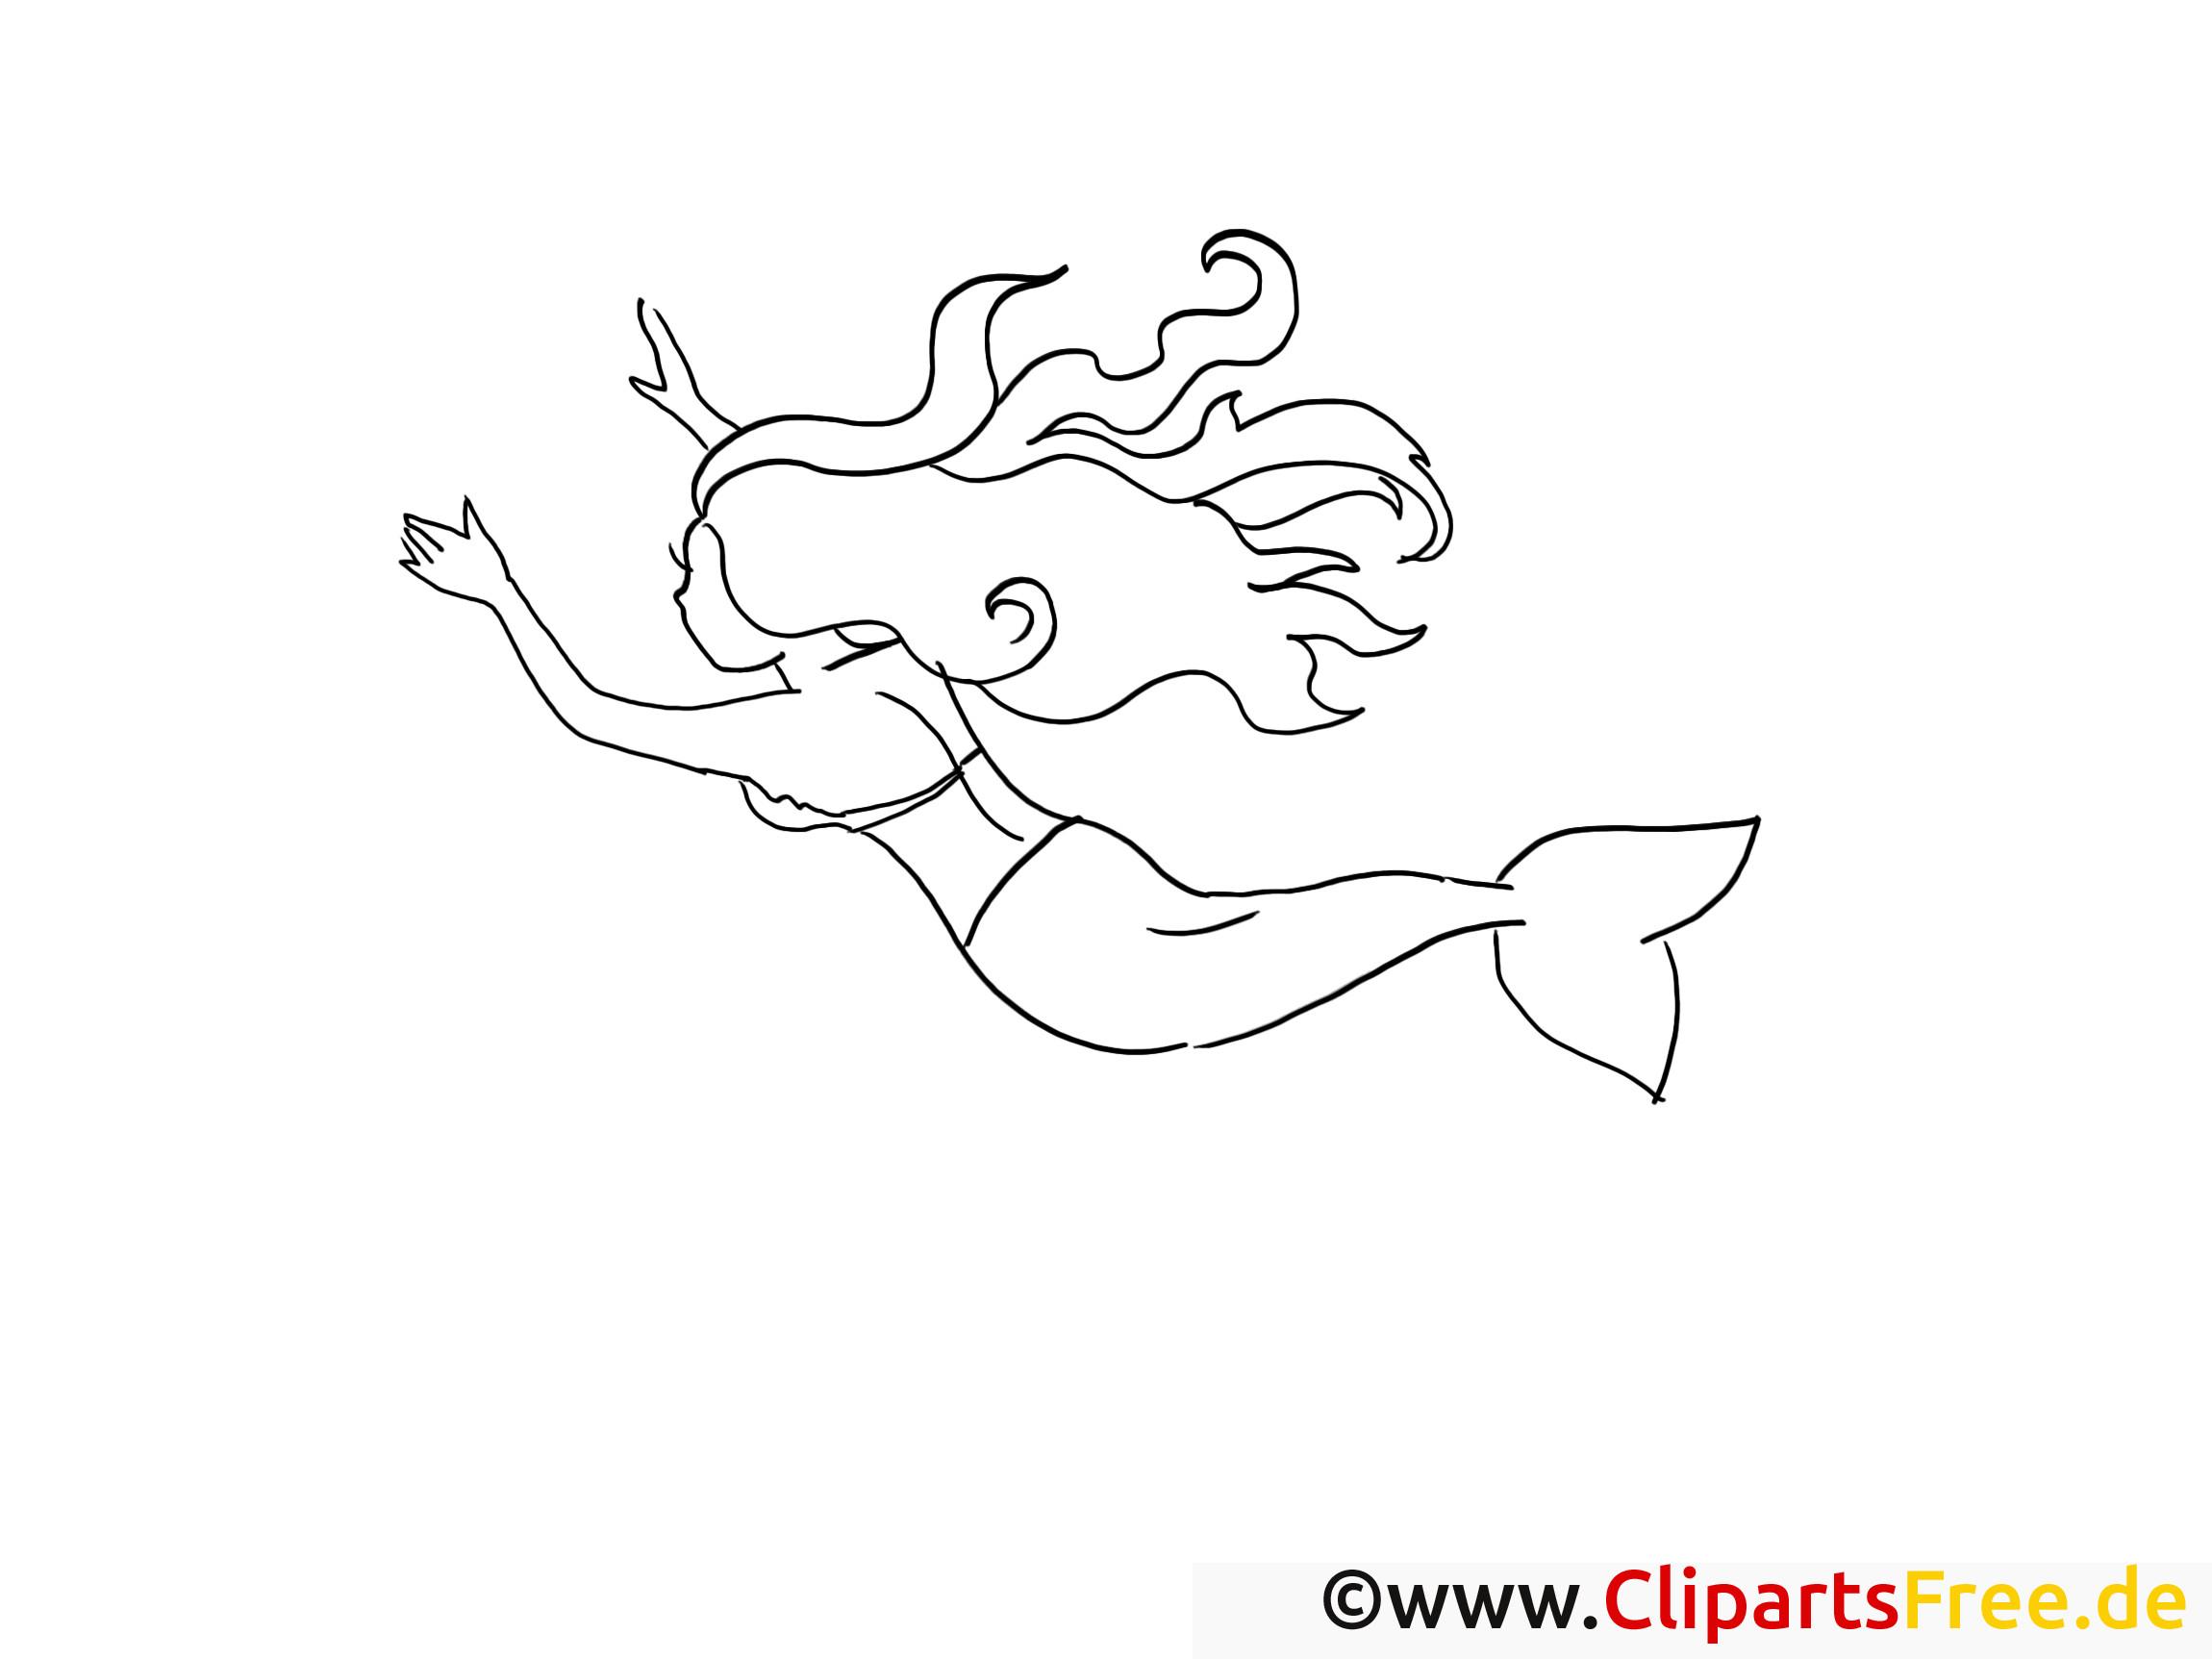 Ausmalbilder H2o Plötzlich Meerjungfrau Inspirierend Meerjungfrau Ausmalbilder Märchen Stock